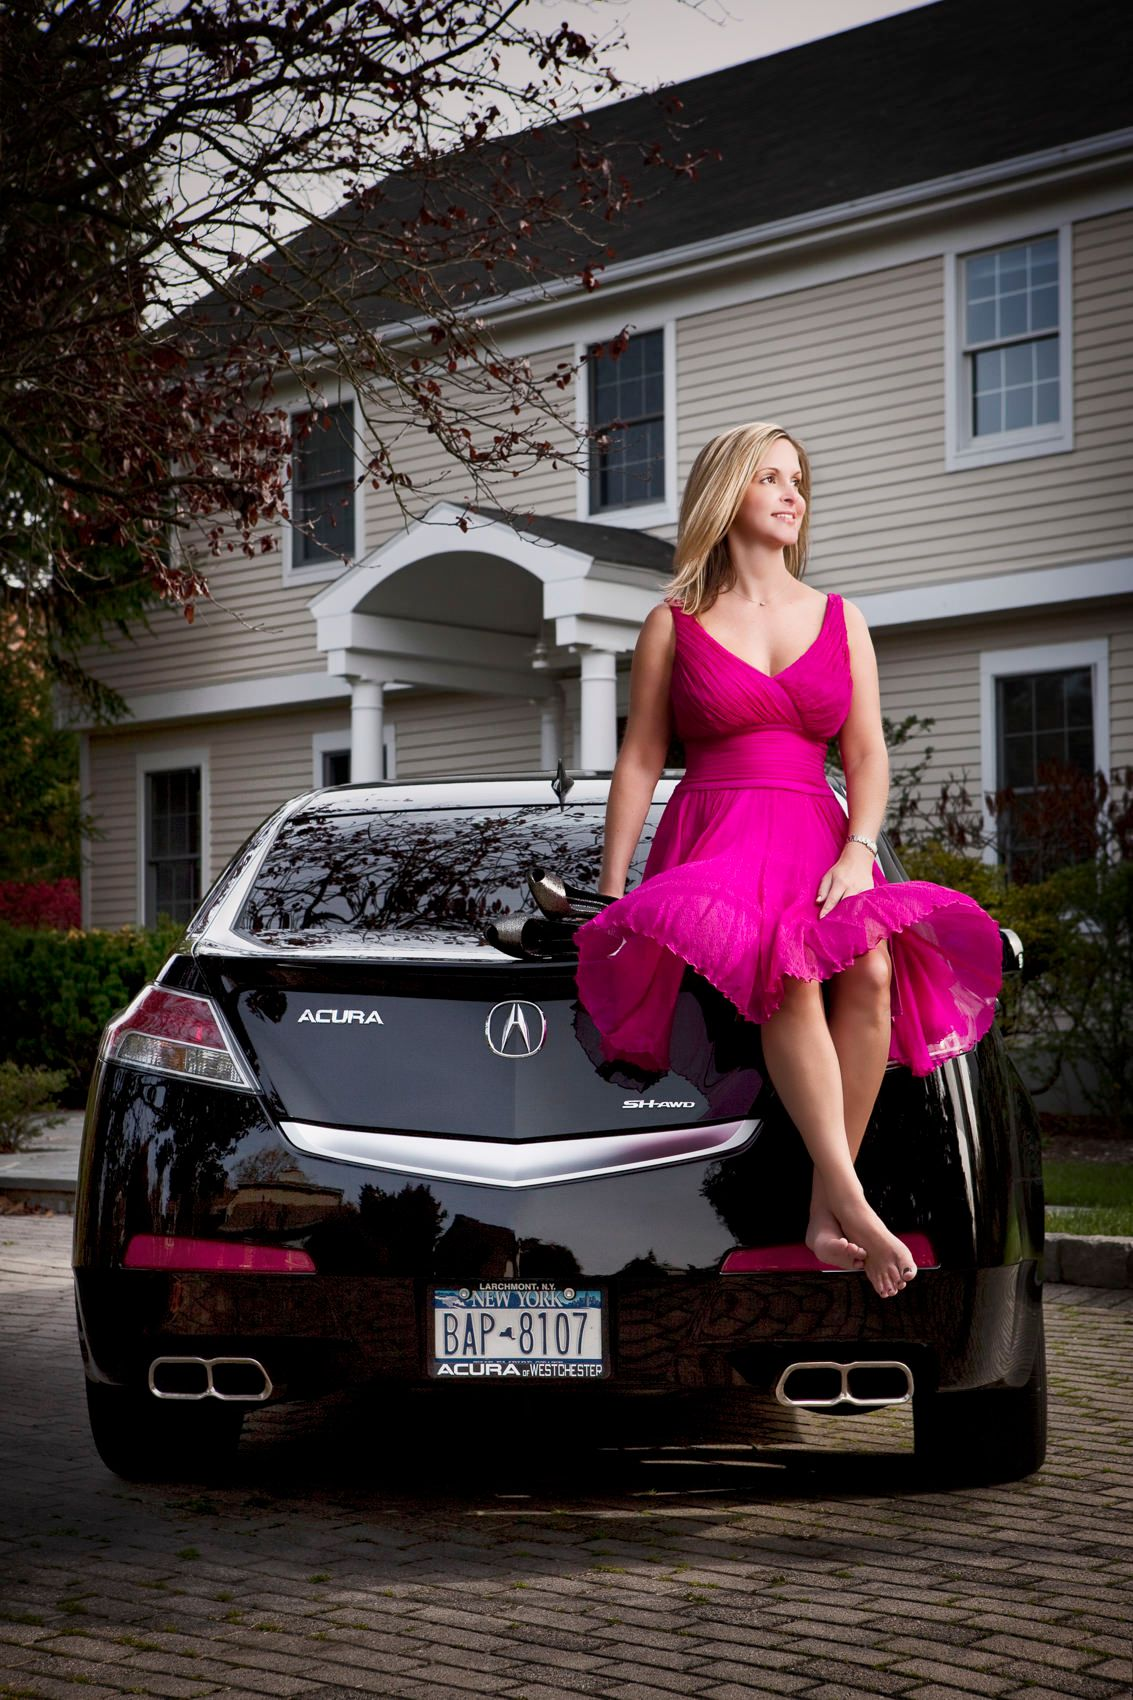 Acura-ad.jpg